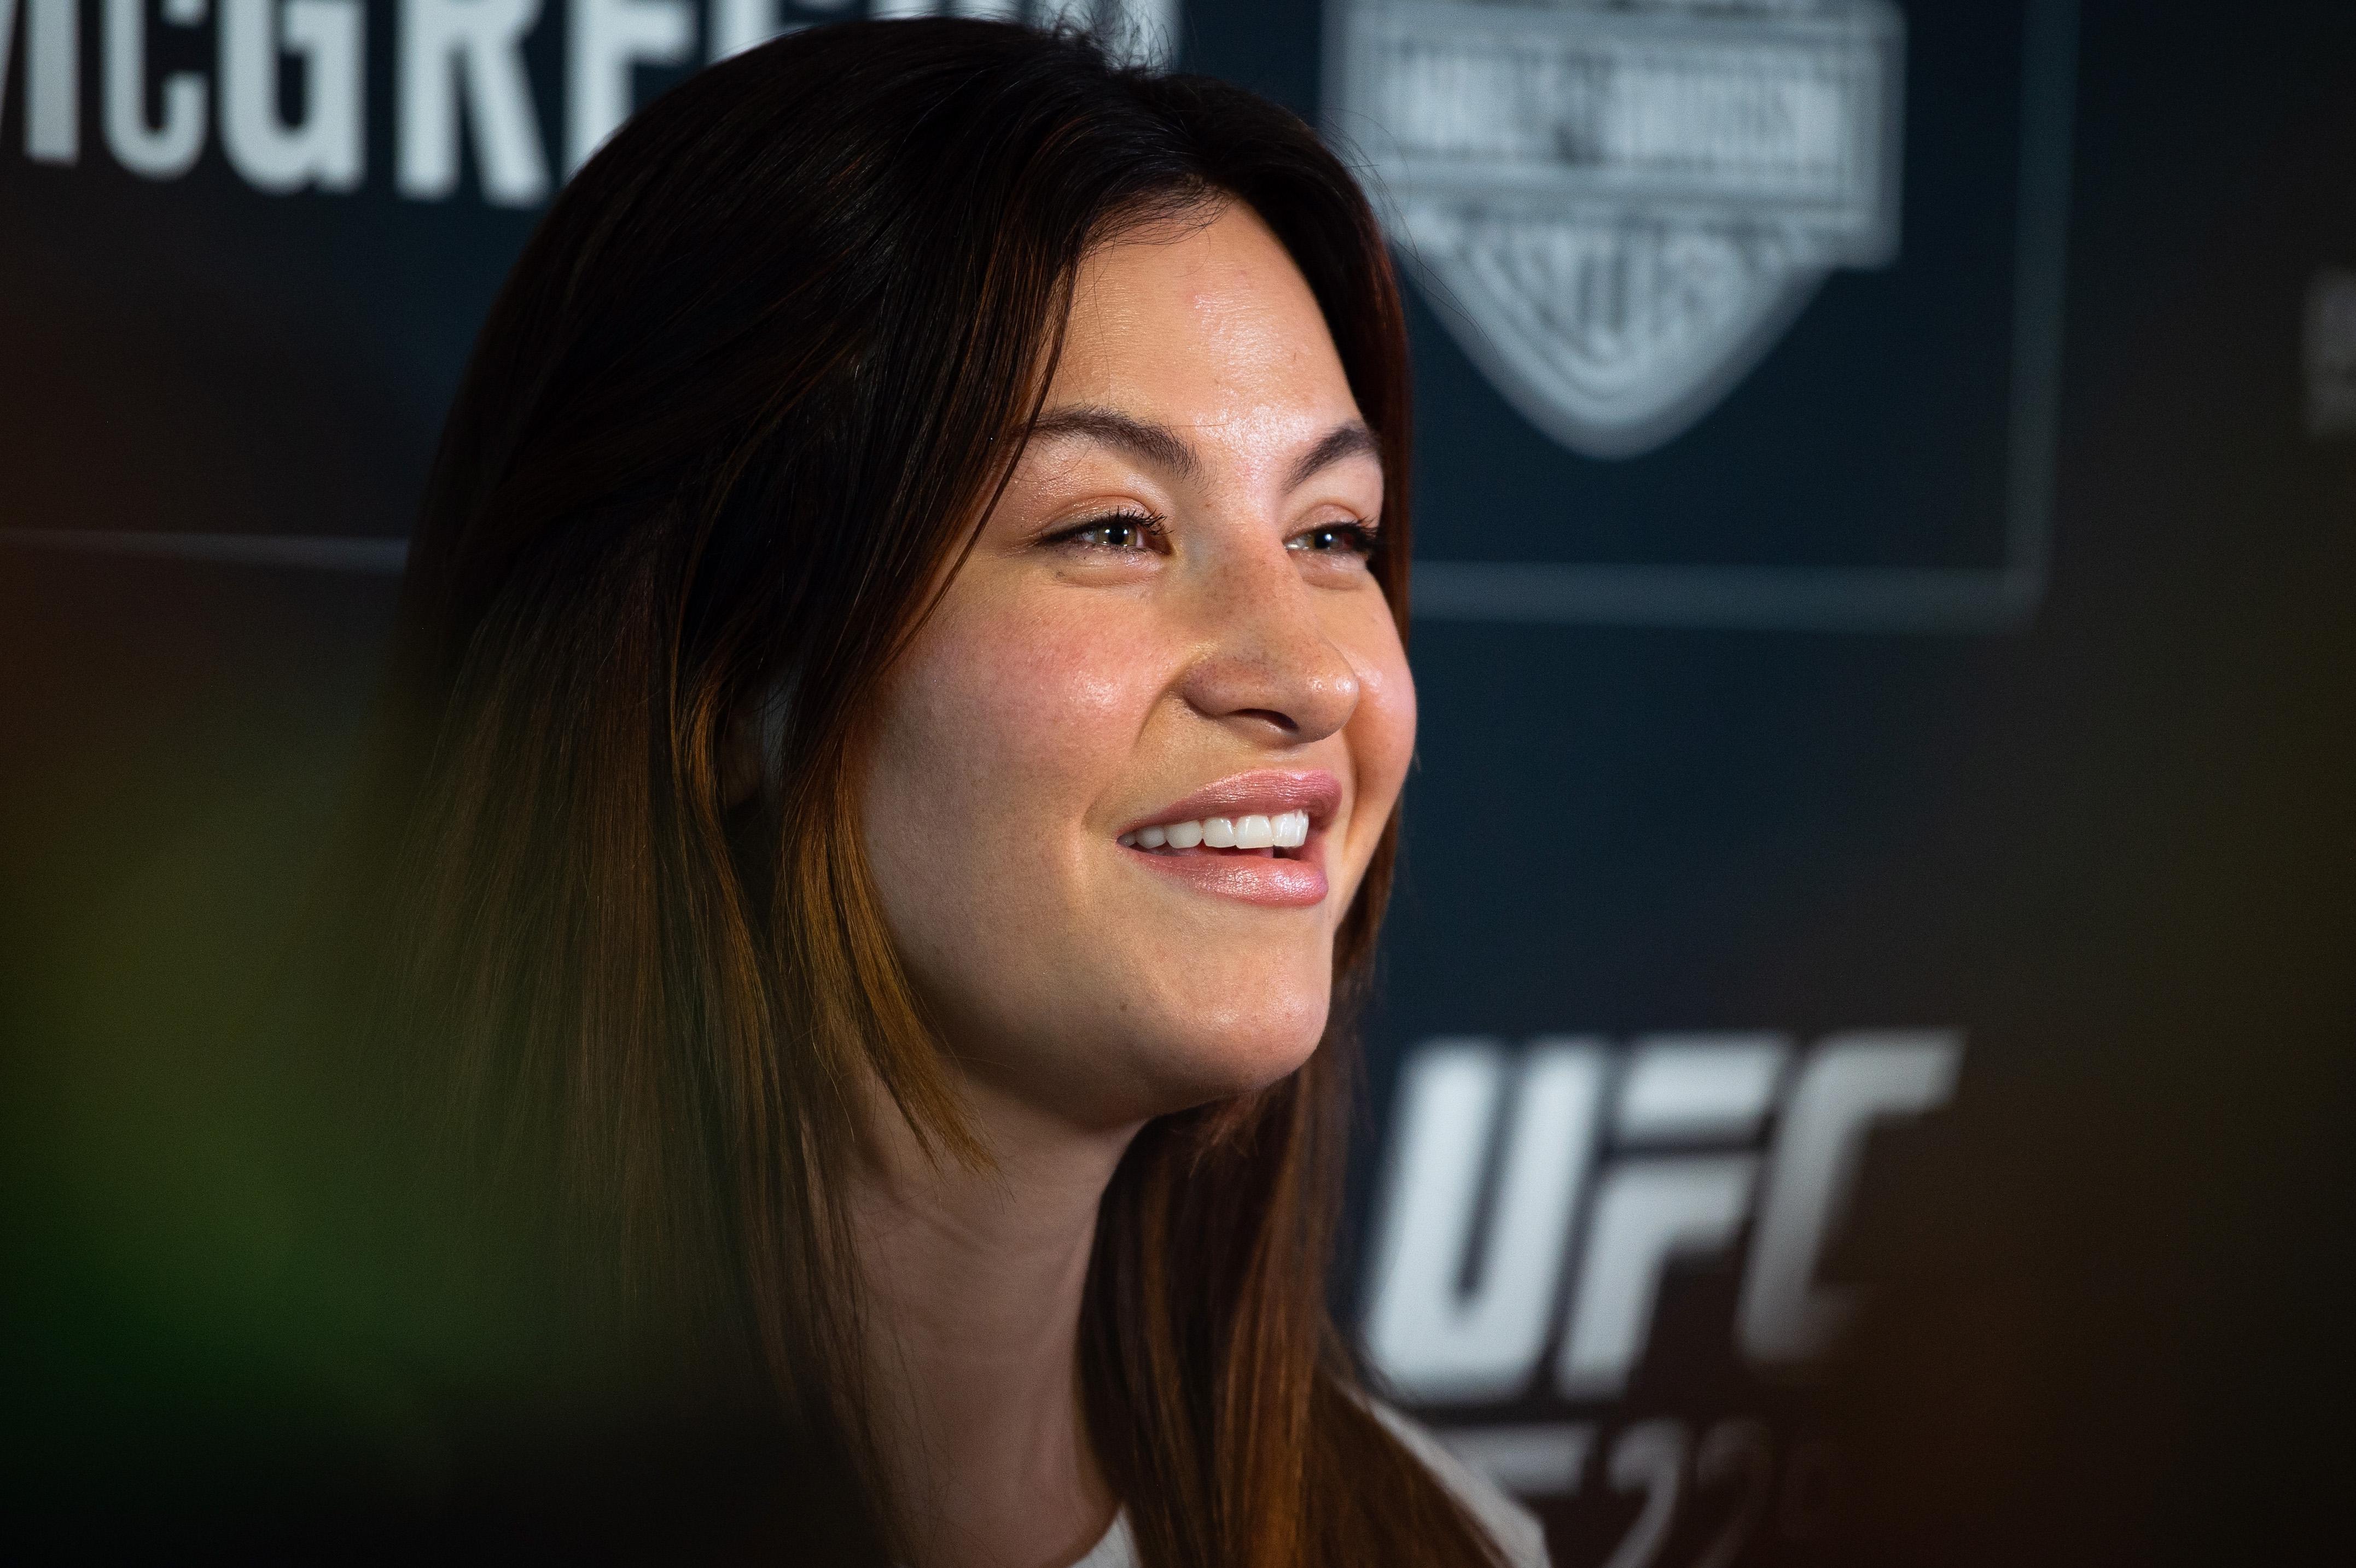 UFC 229: Media Availability